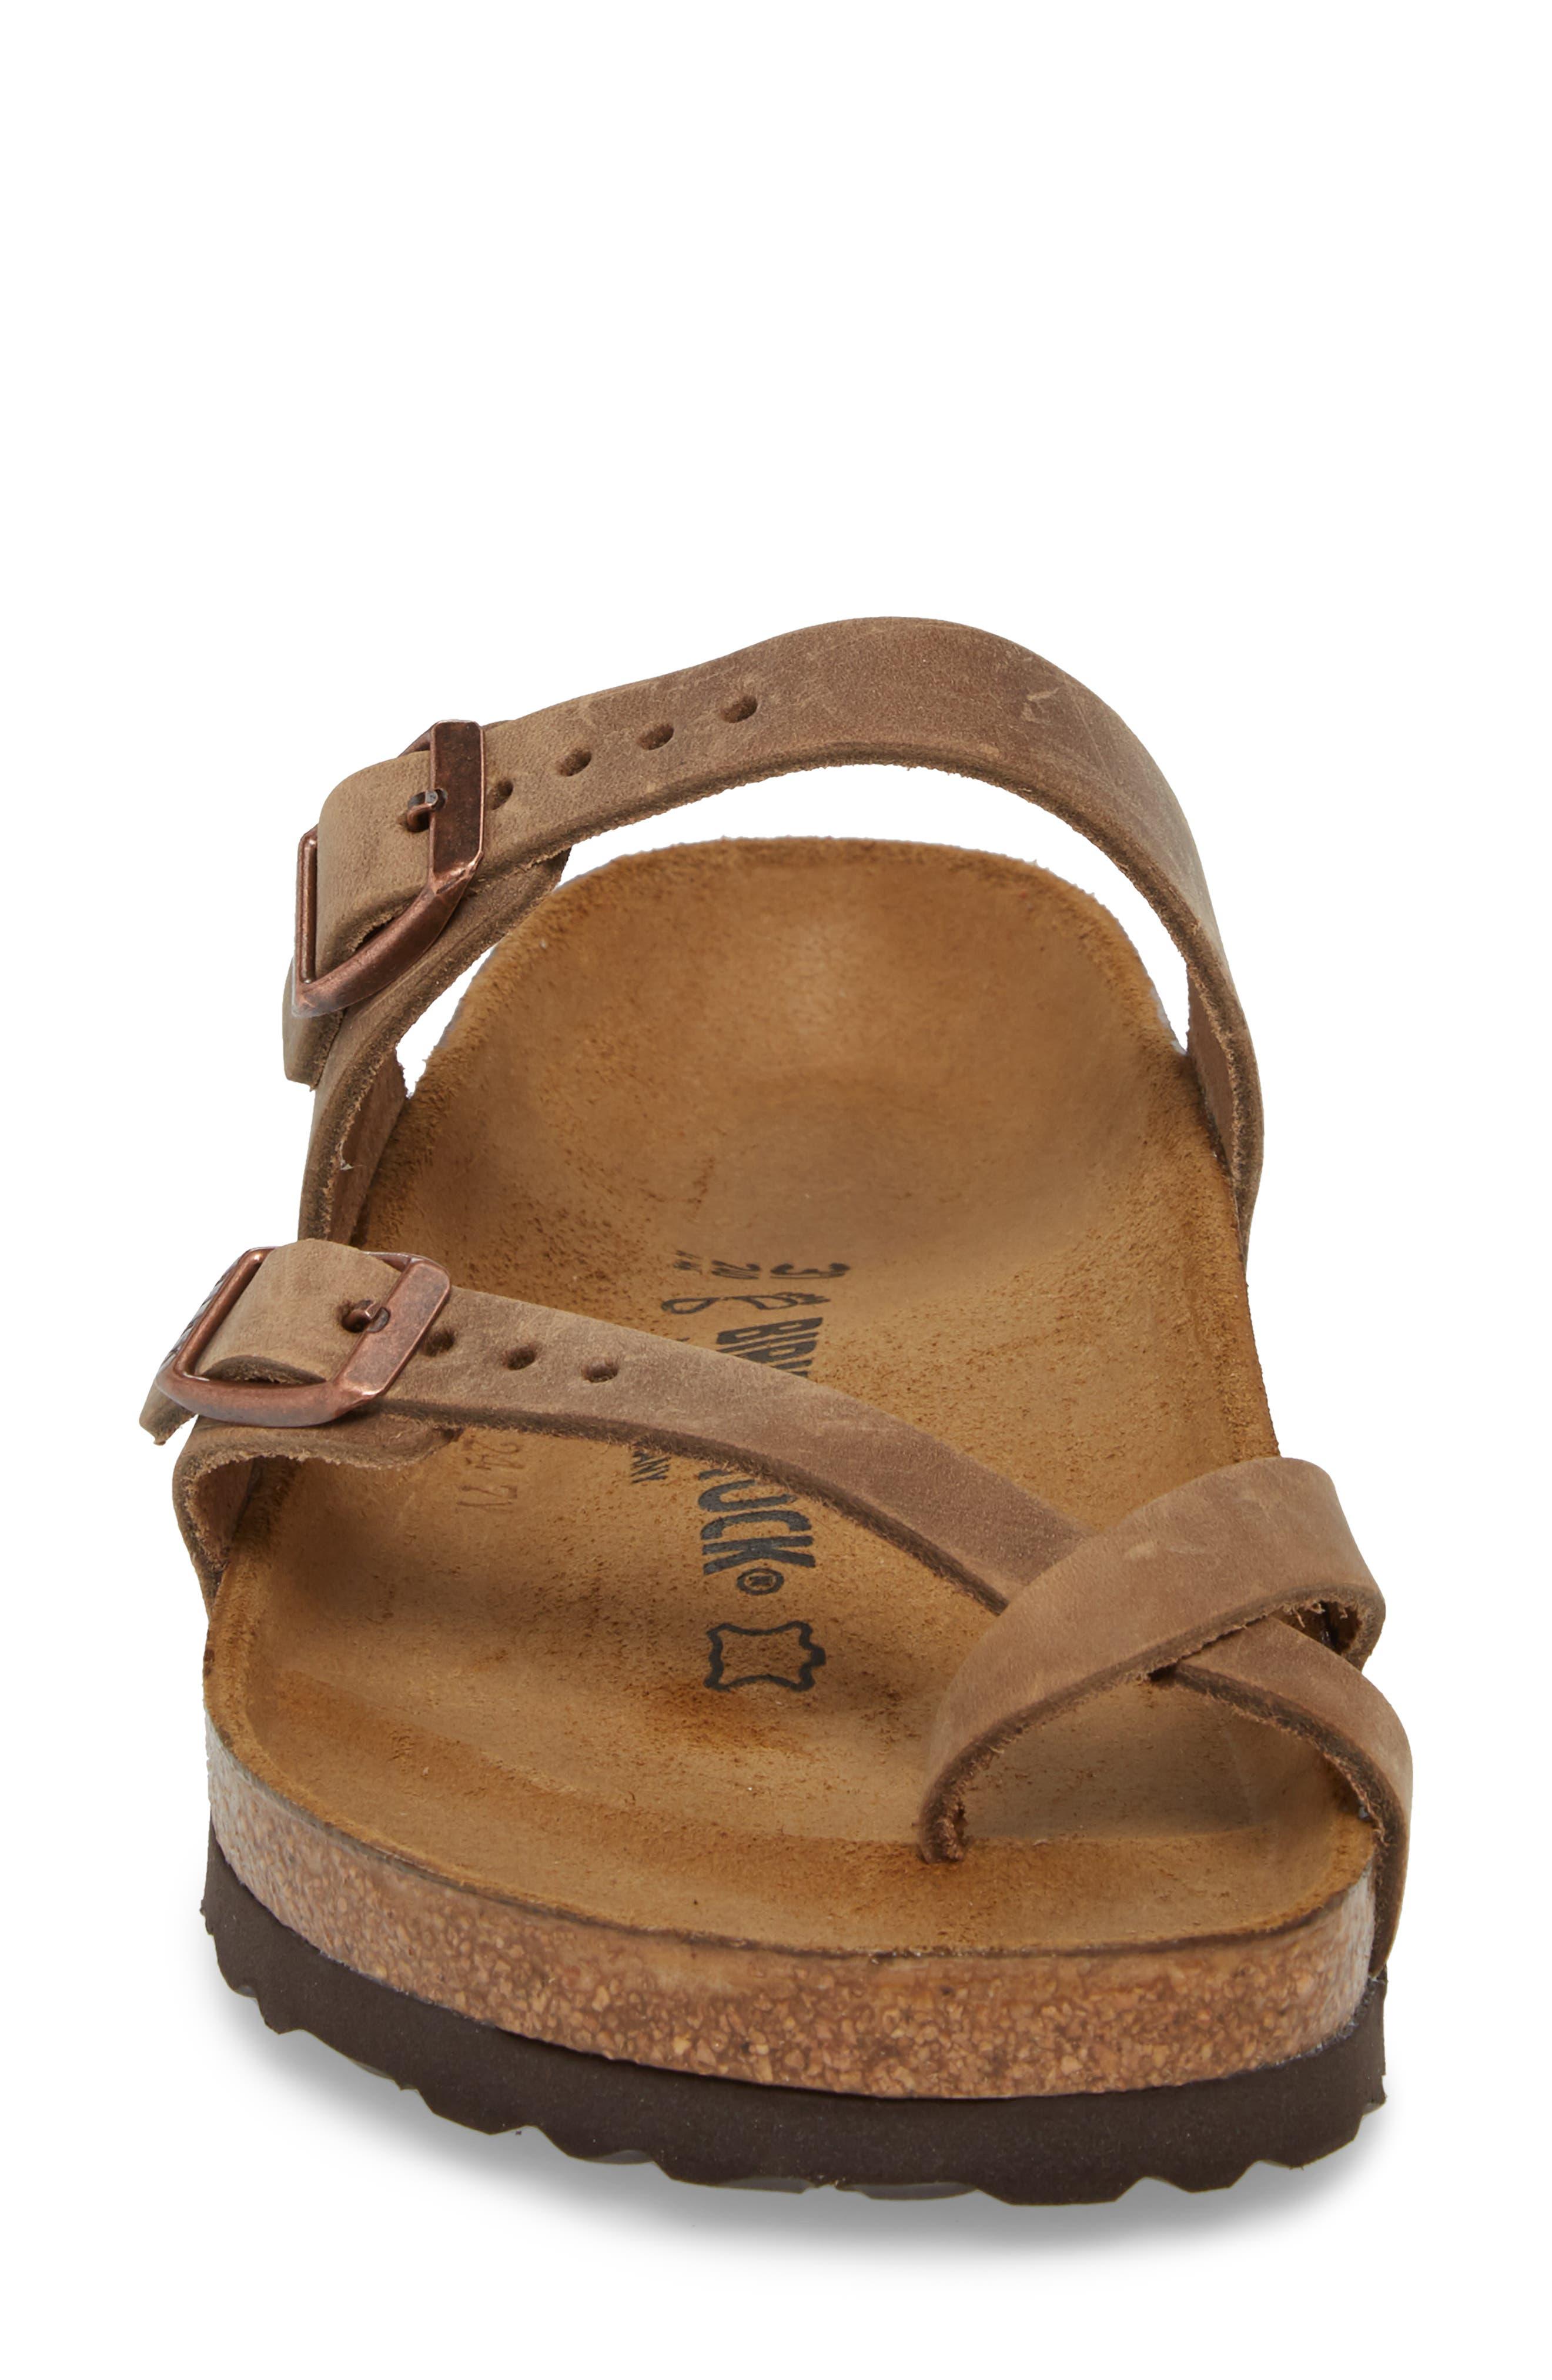 Mayari Slide Sandal,                             Alternate thumbnail 4, color,                             Tobacco Oiled Leather